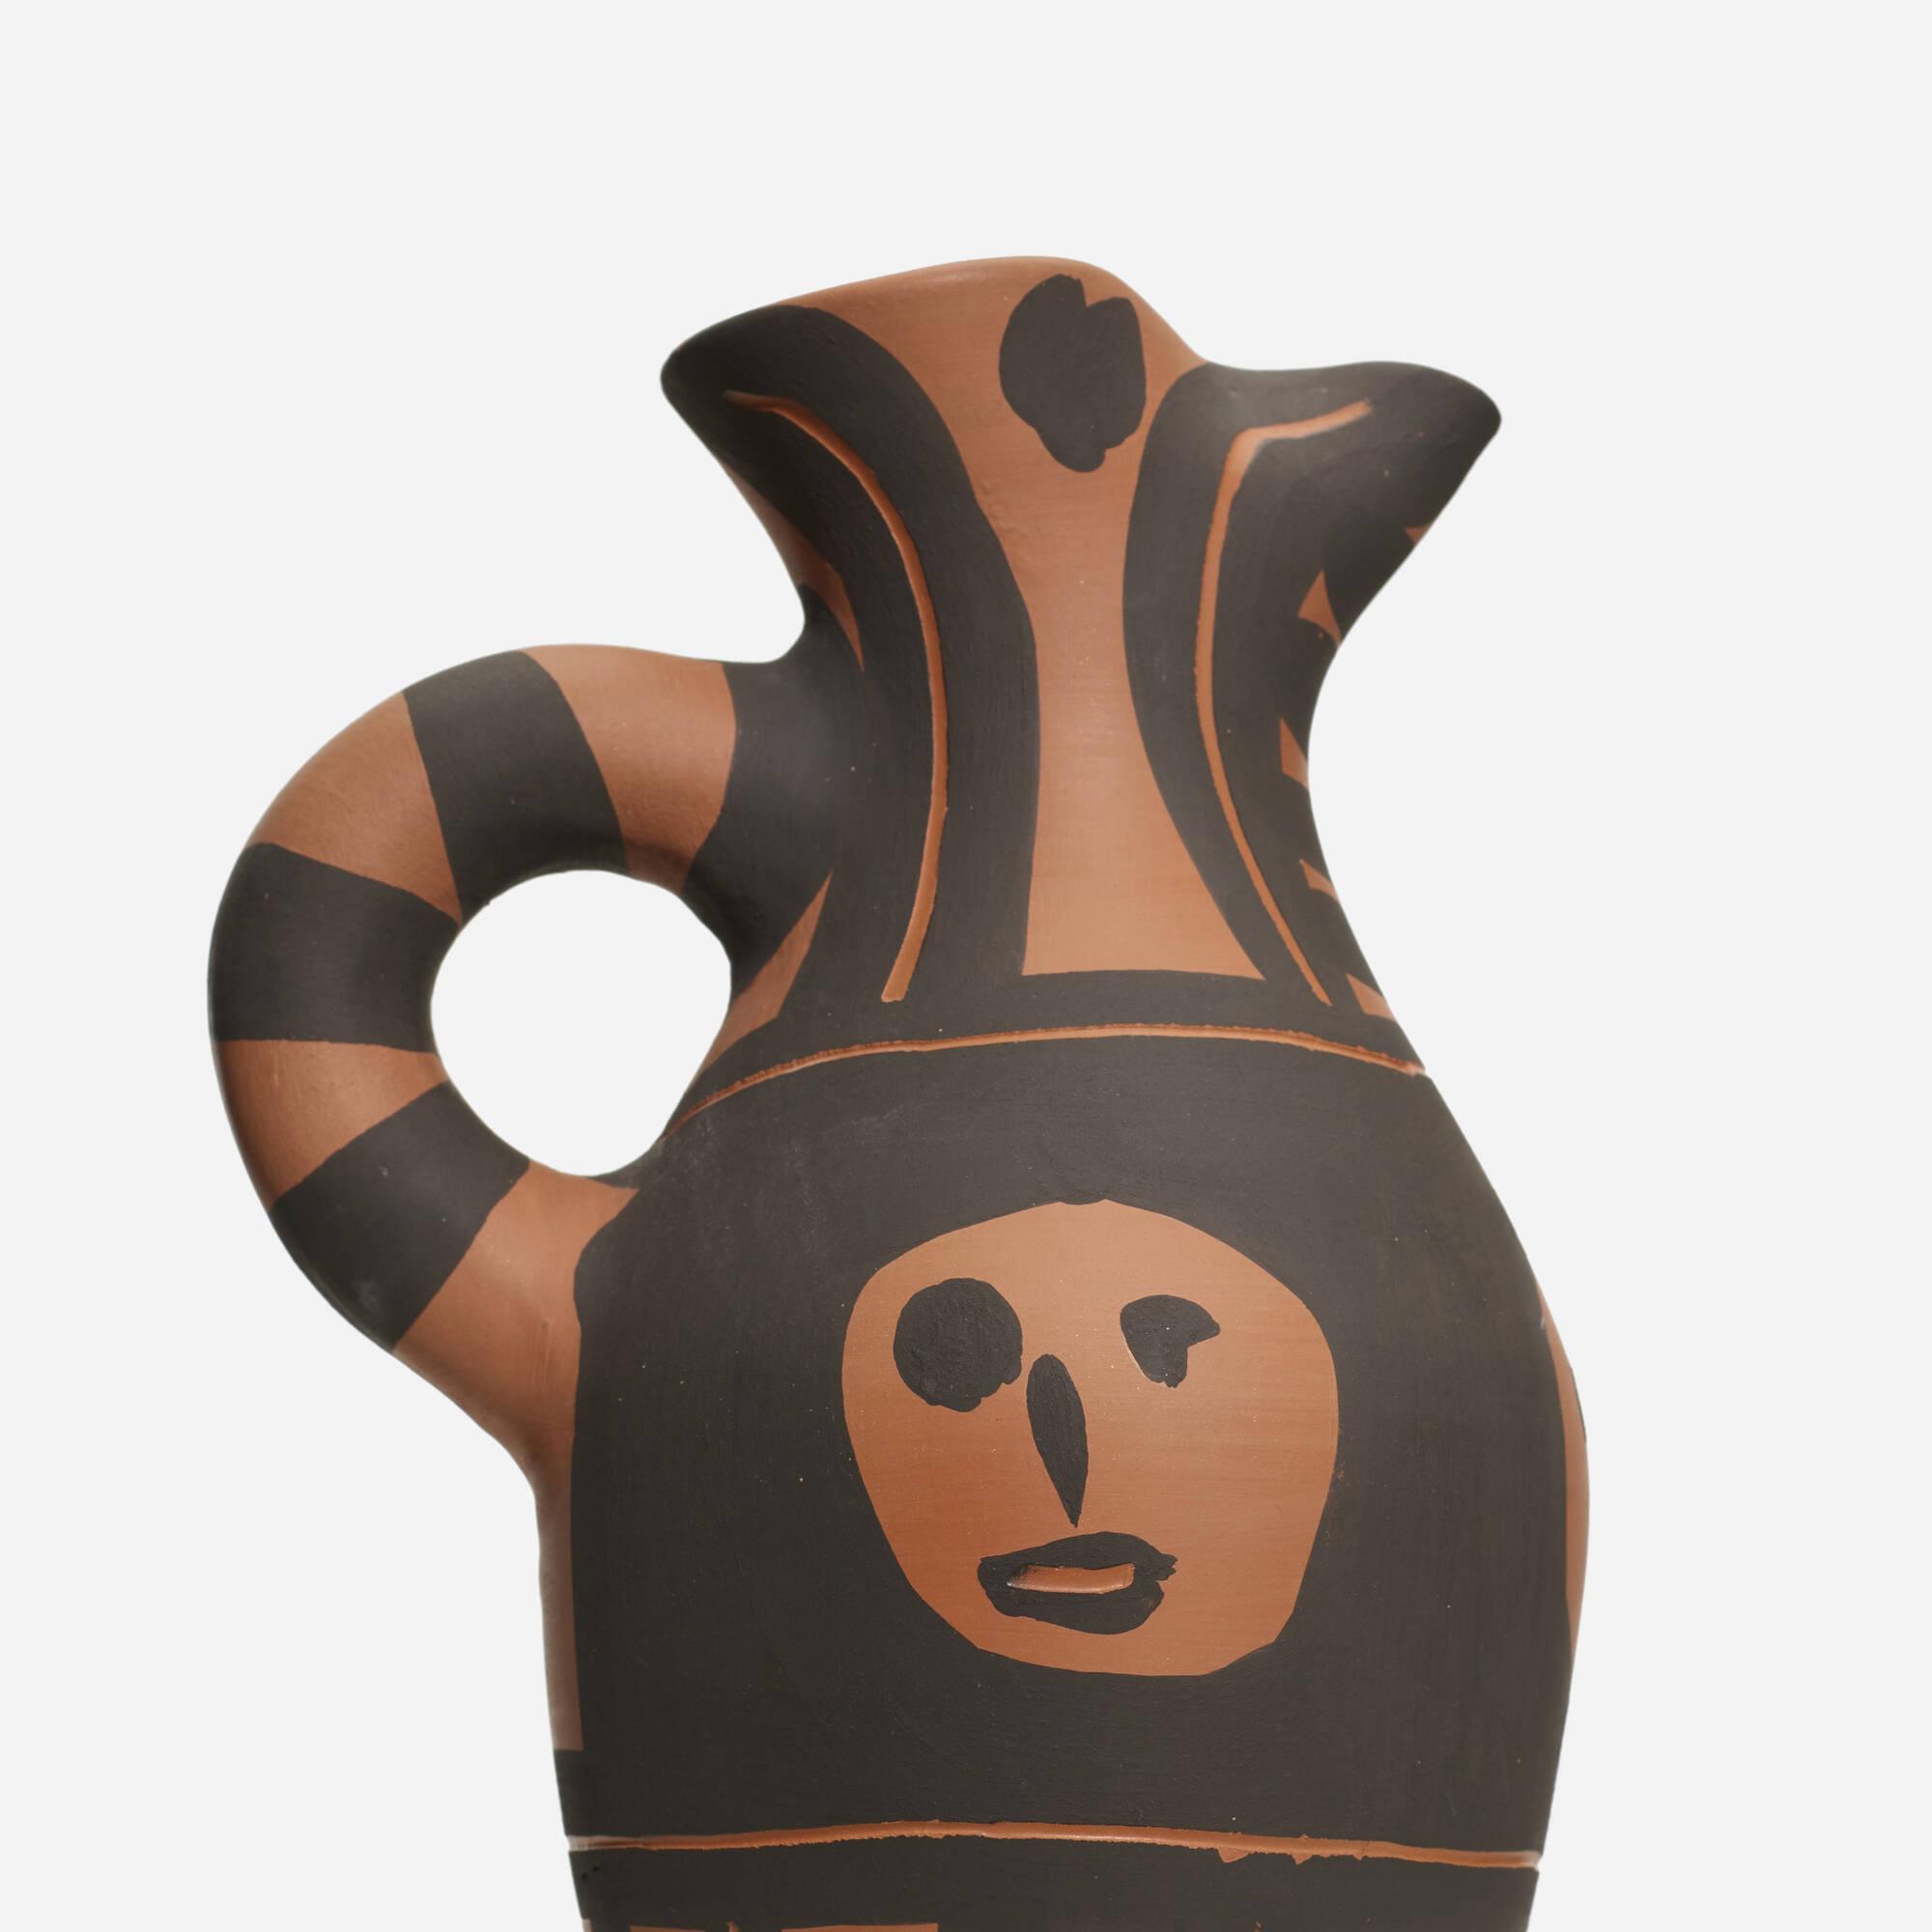 132: Pablo Picasso / Yan Black Headband ewer (2 of 3)